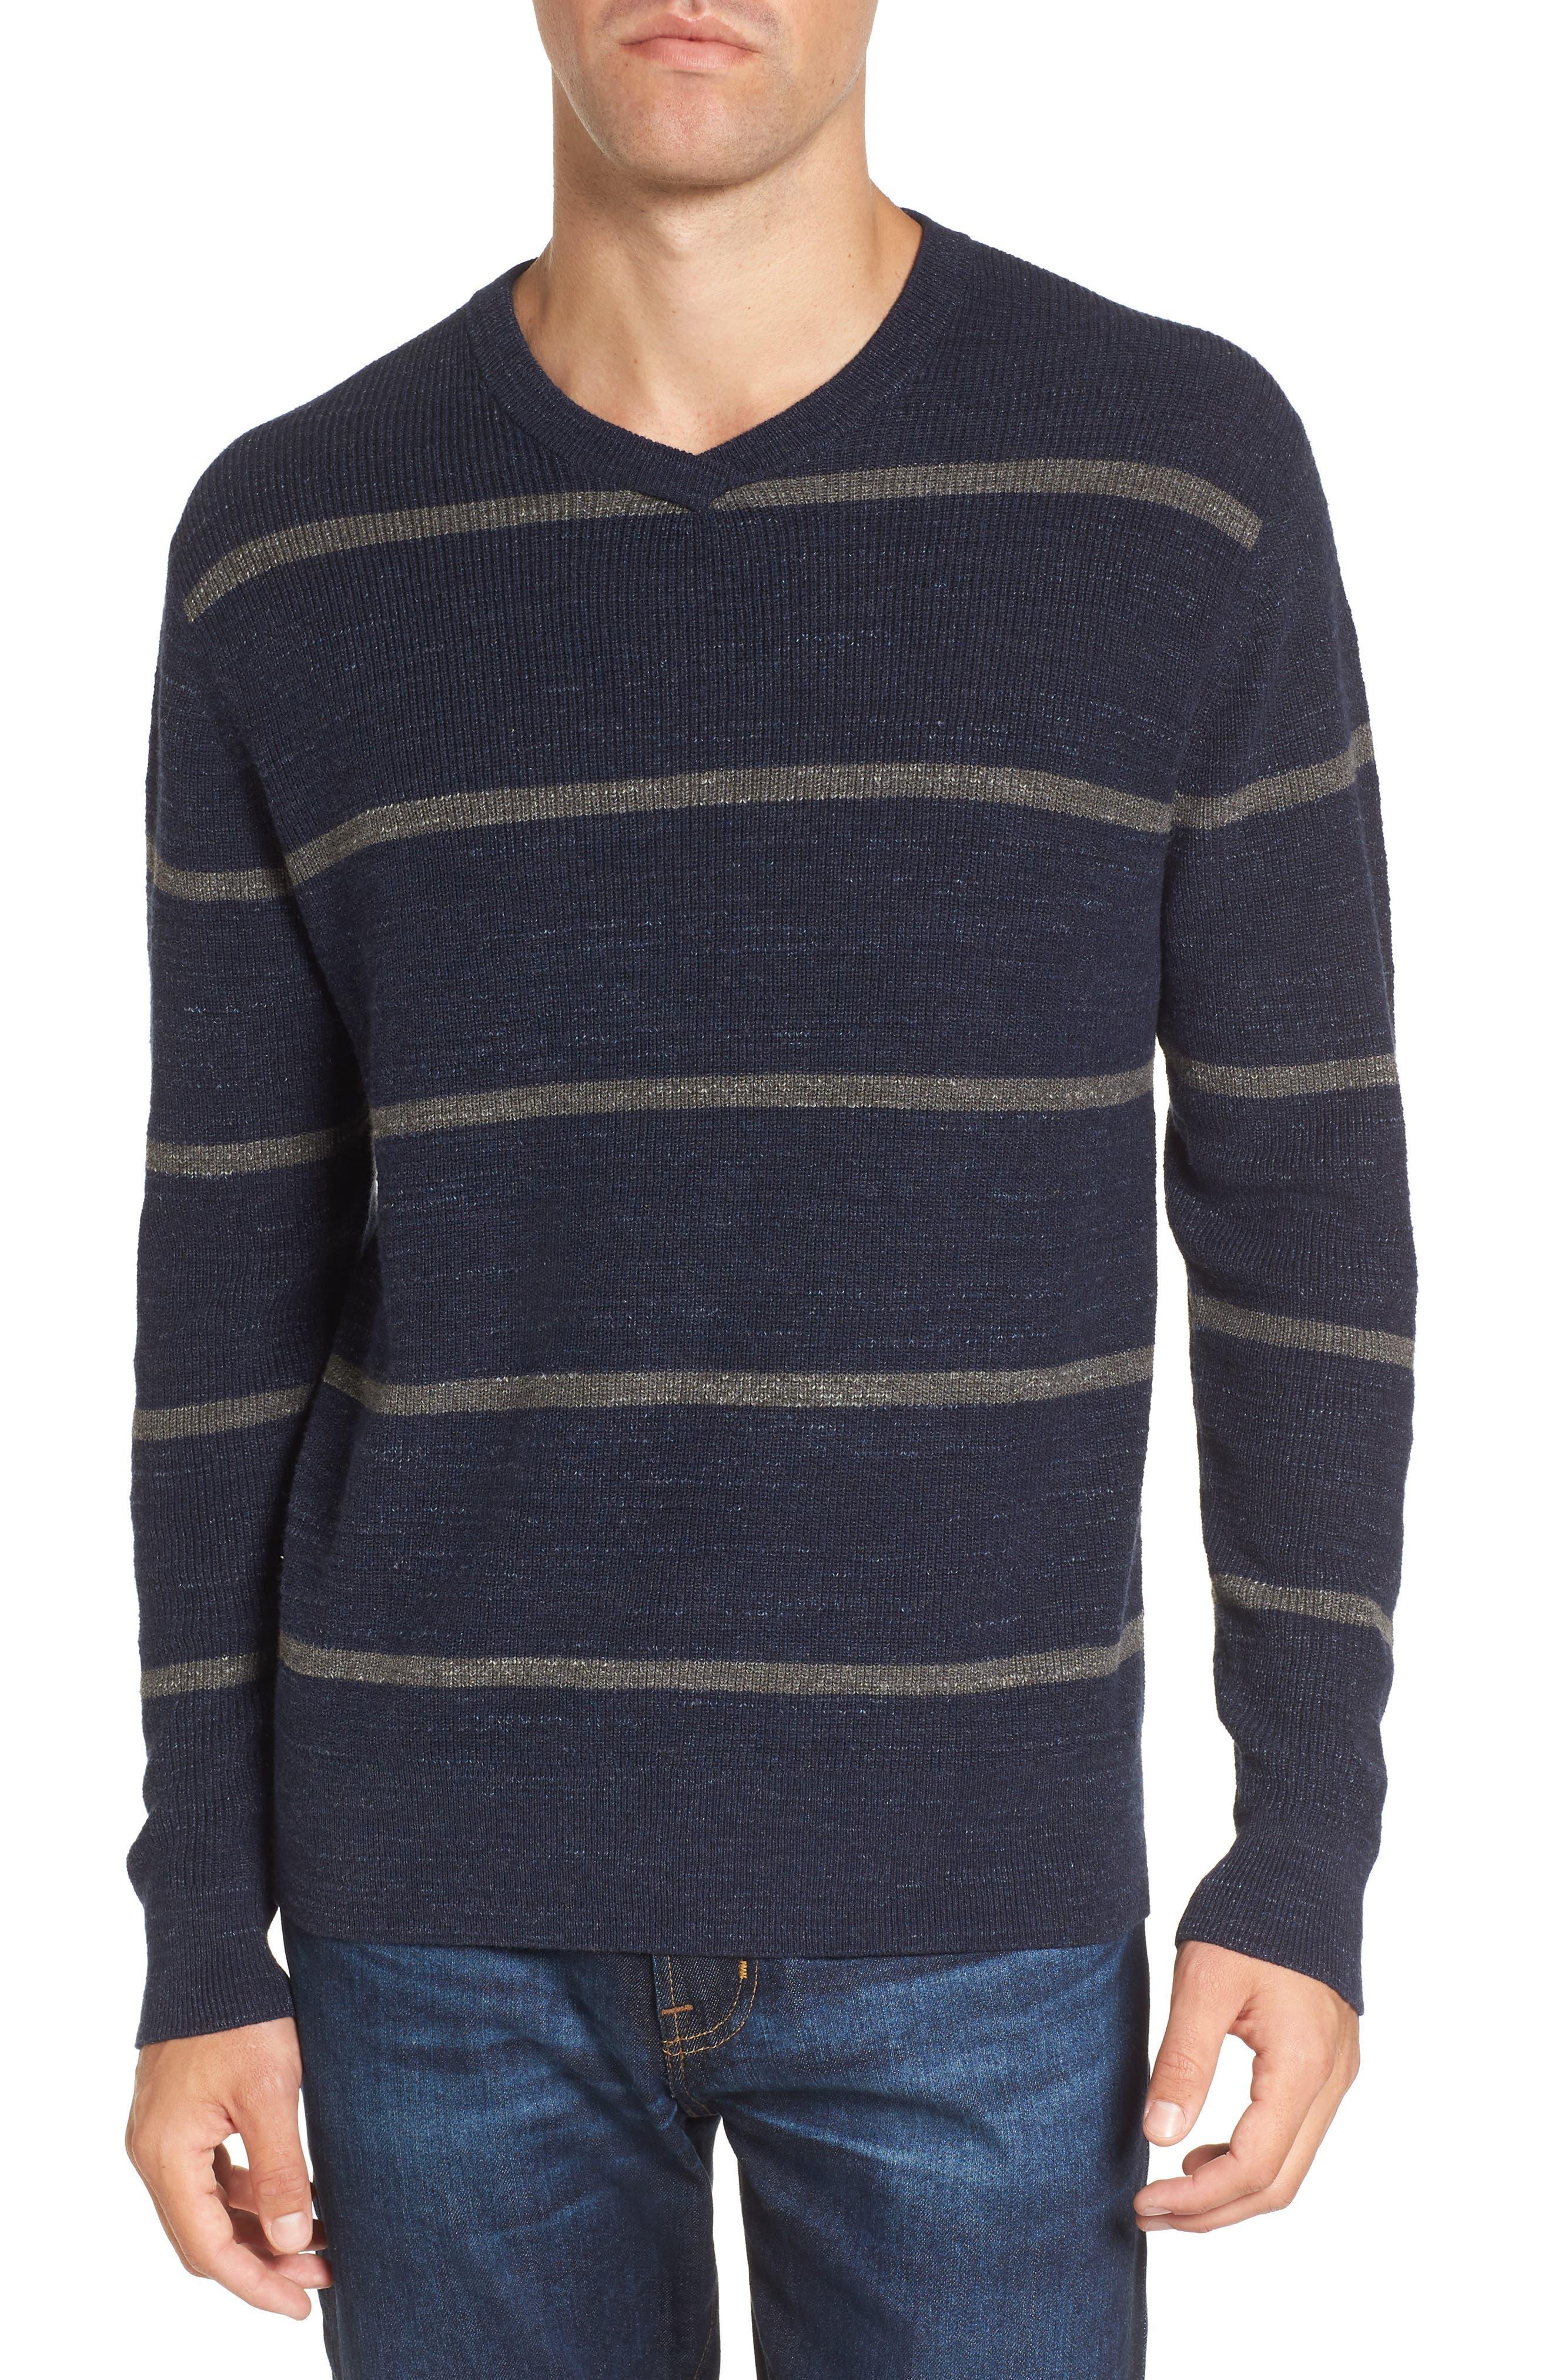 Ardsley Stripe V-Neck Sweater,                         Main,                         color, Navy/Light Charcoal